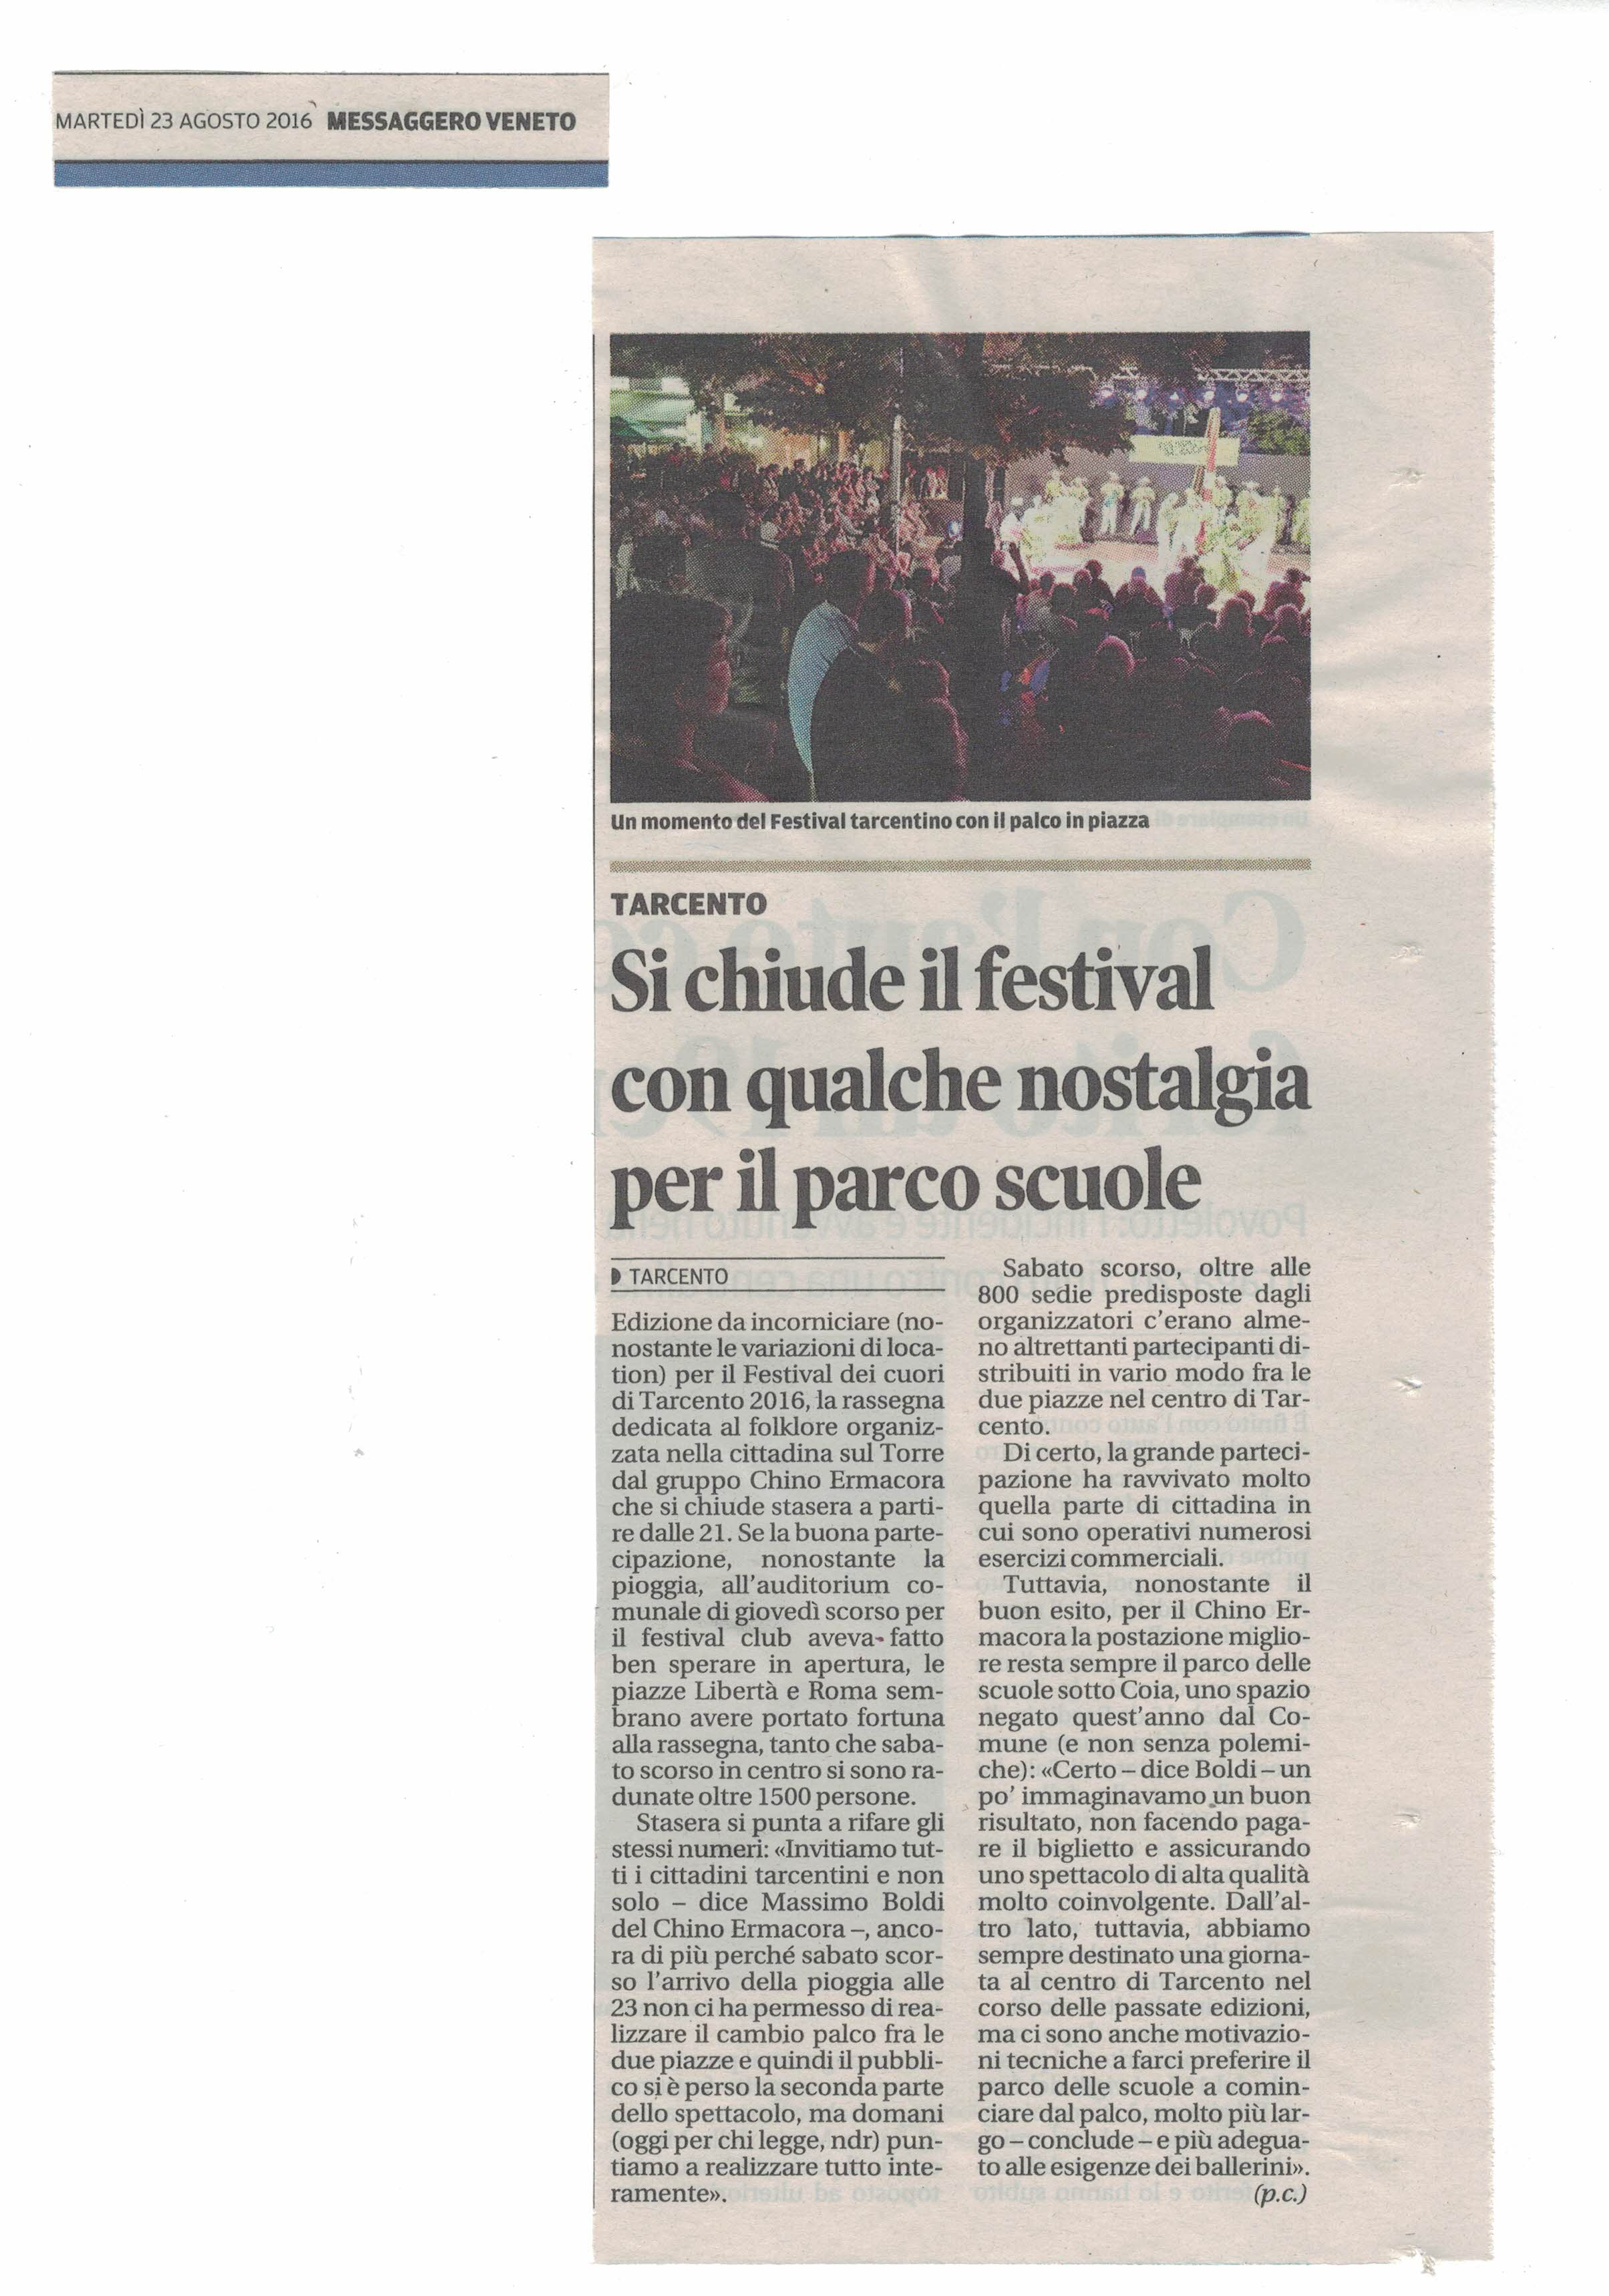 Messaggero Veneto 23.08.2016